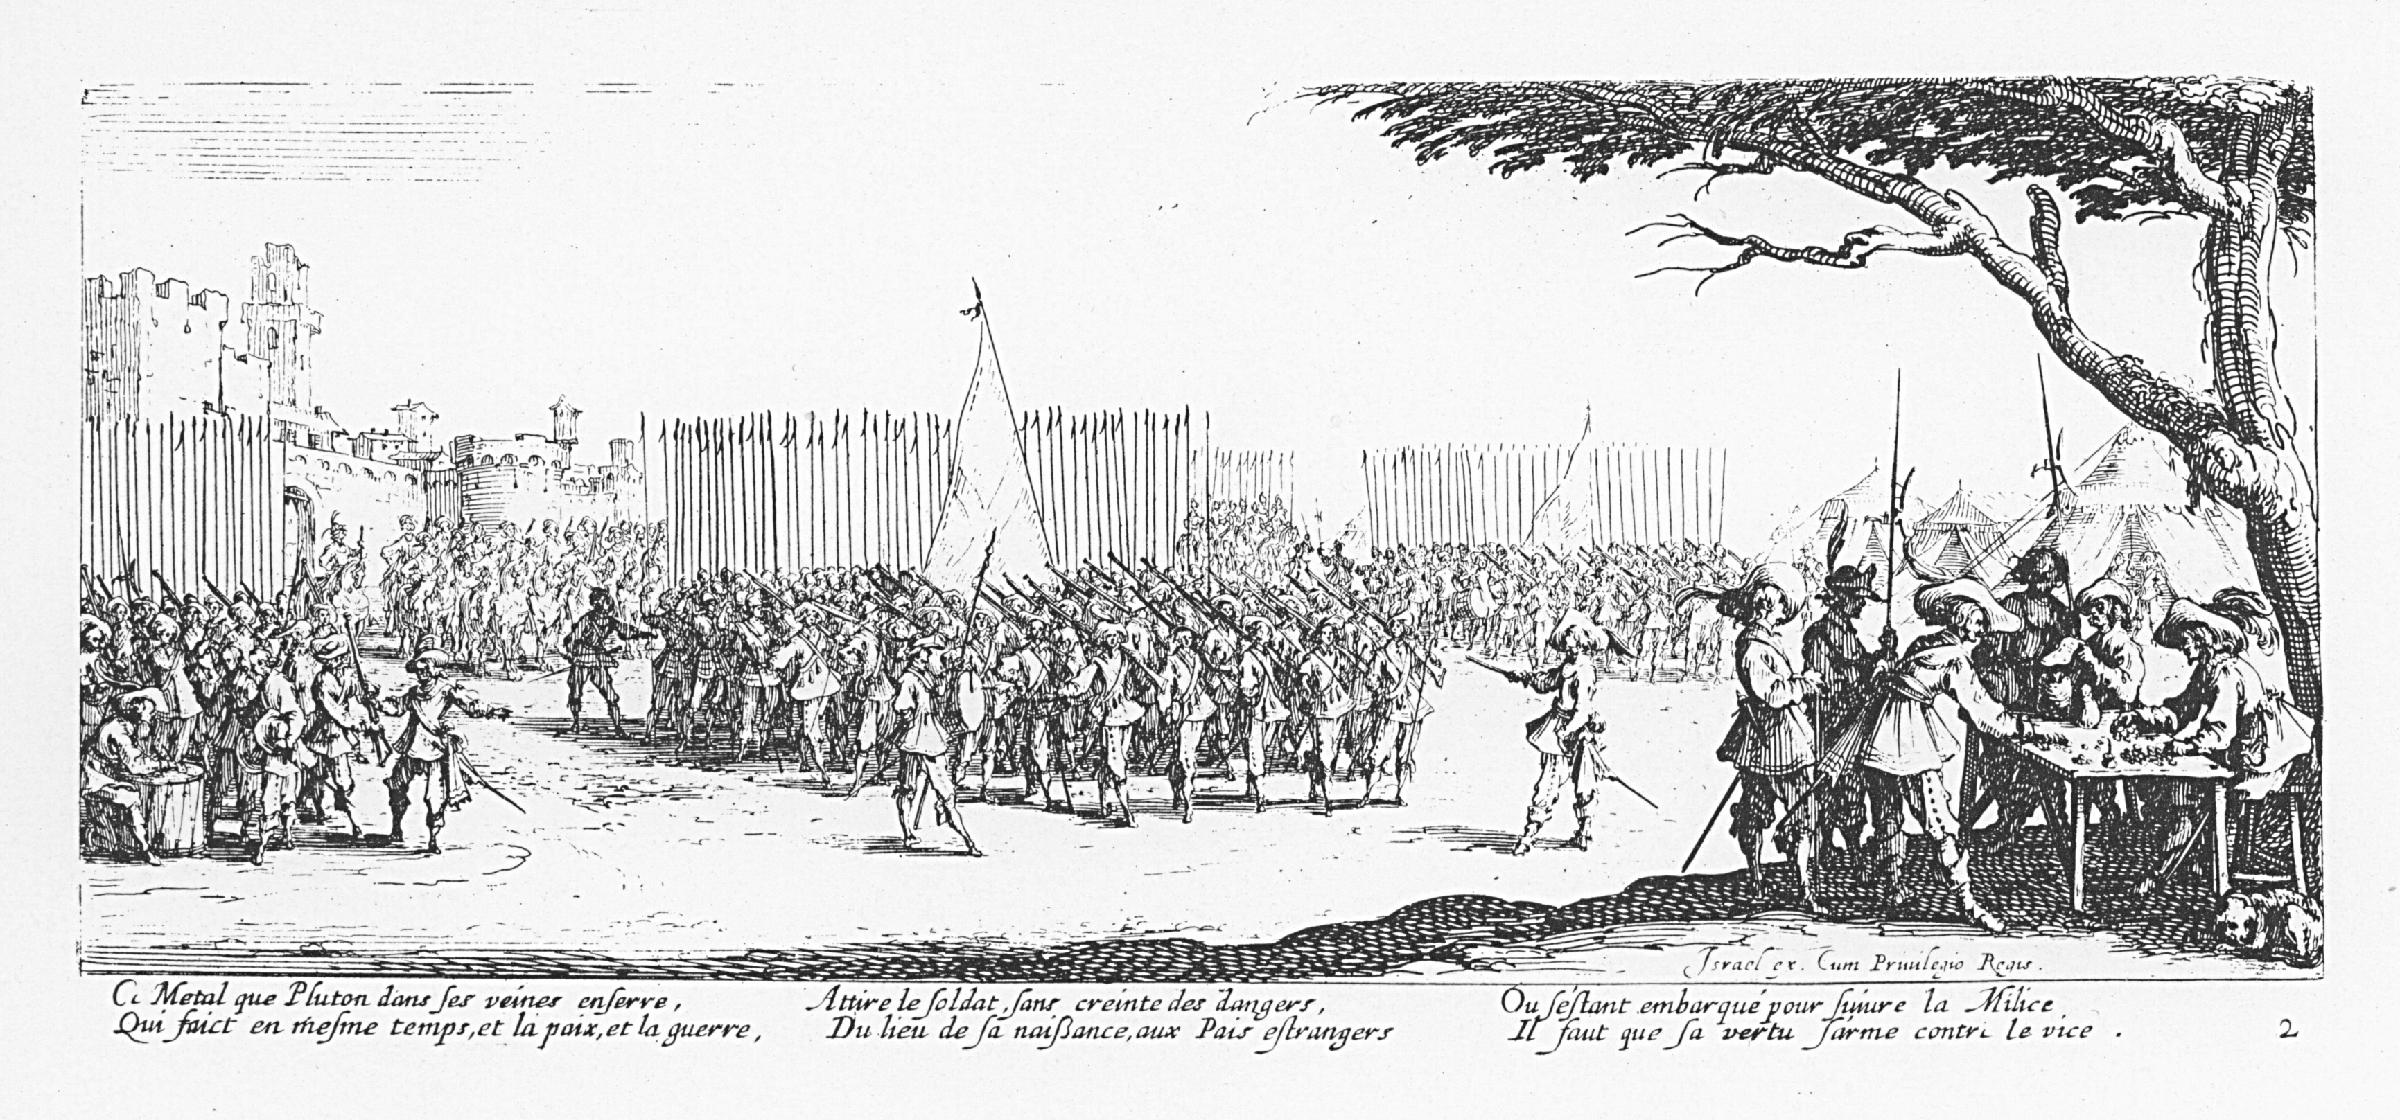 L'enrôlement des troupes.Sumber gambar: wikimedia.org